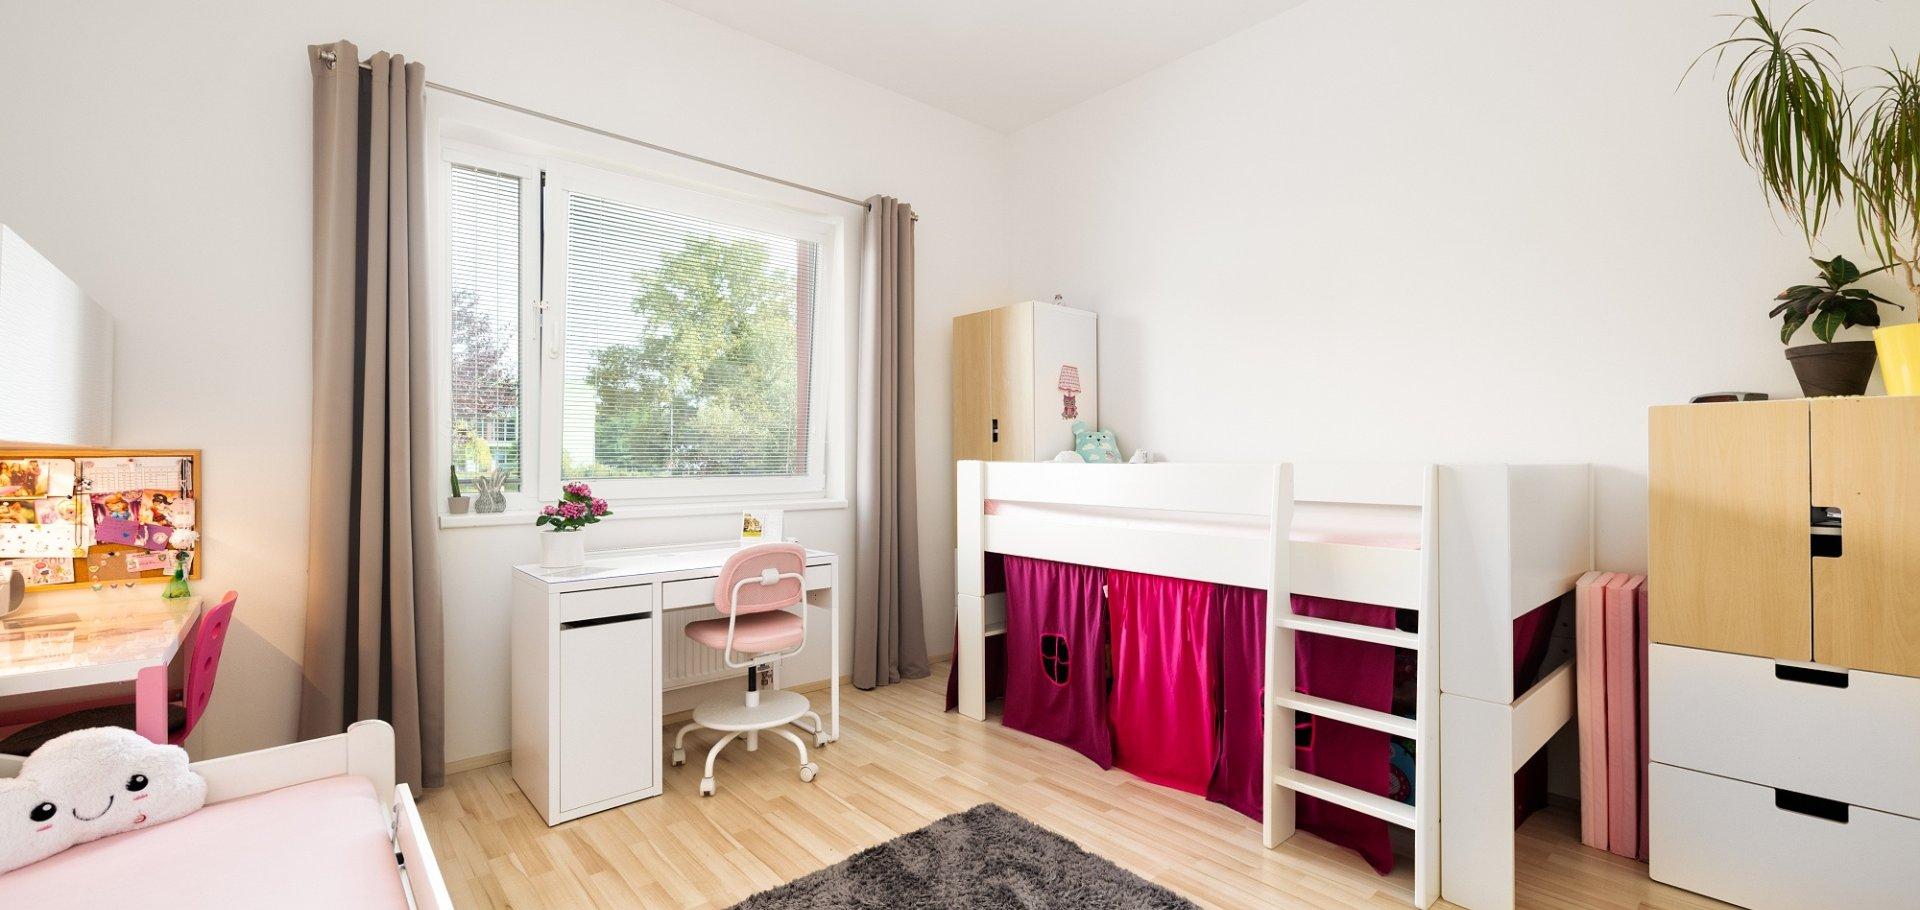 Prodej, Byty 4+kk, 100m² - Brno - Líšeň